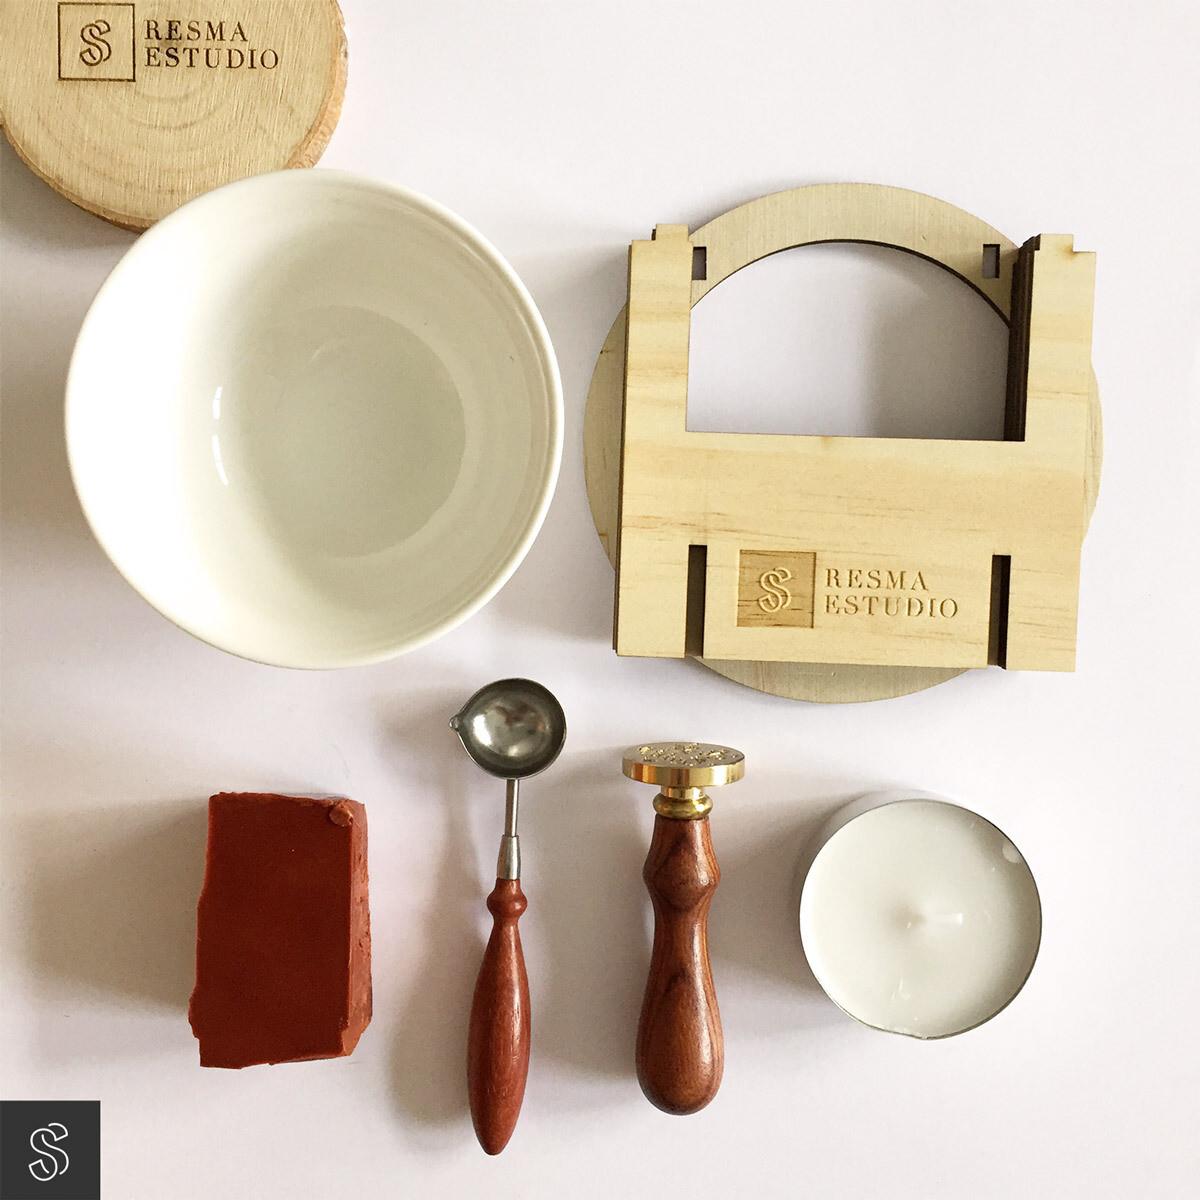 Kit de lacrado tradicional